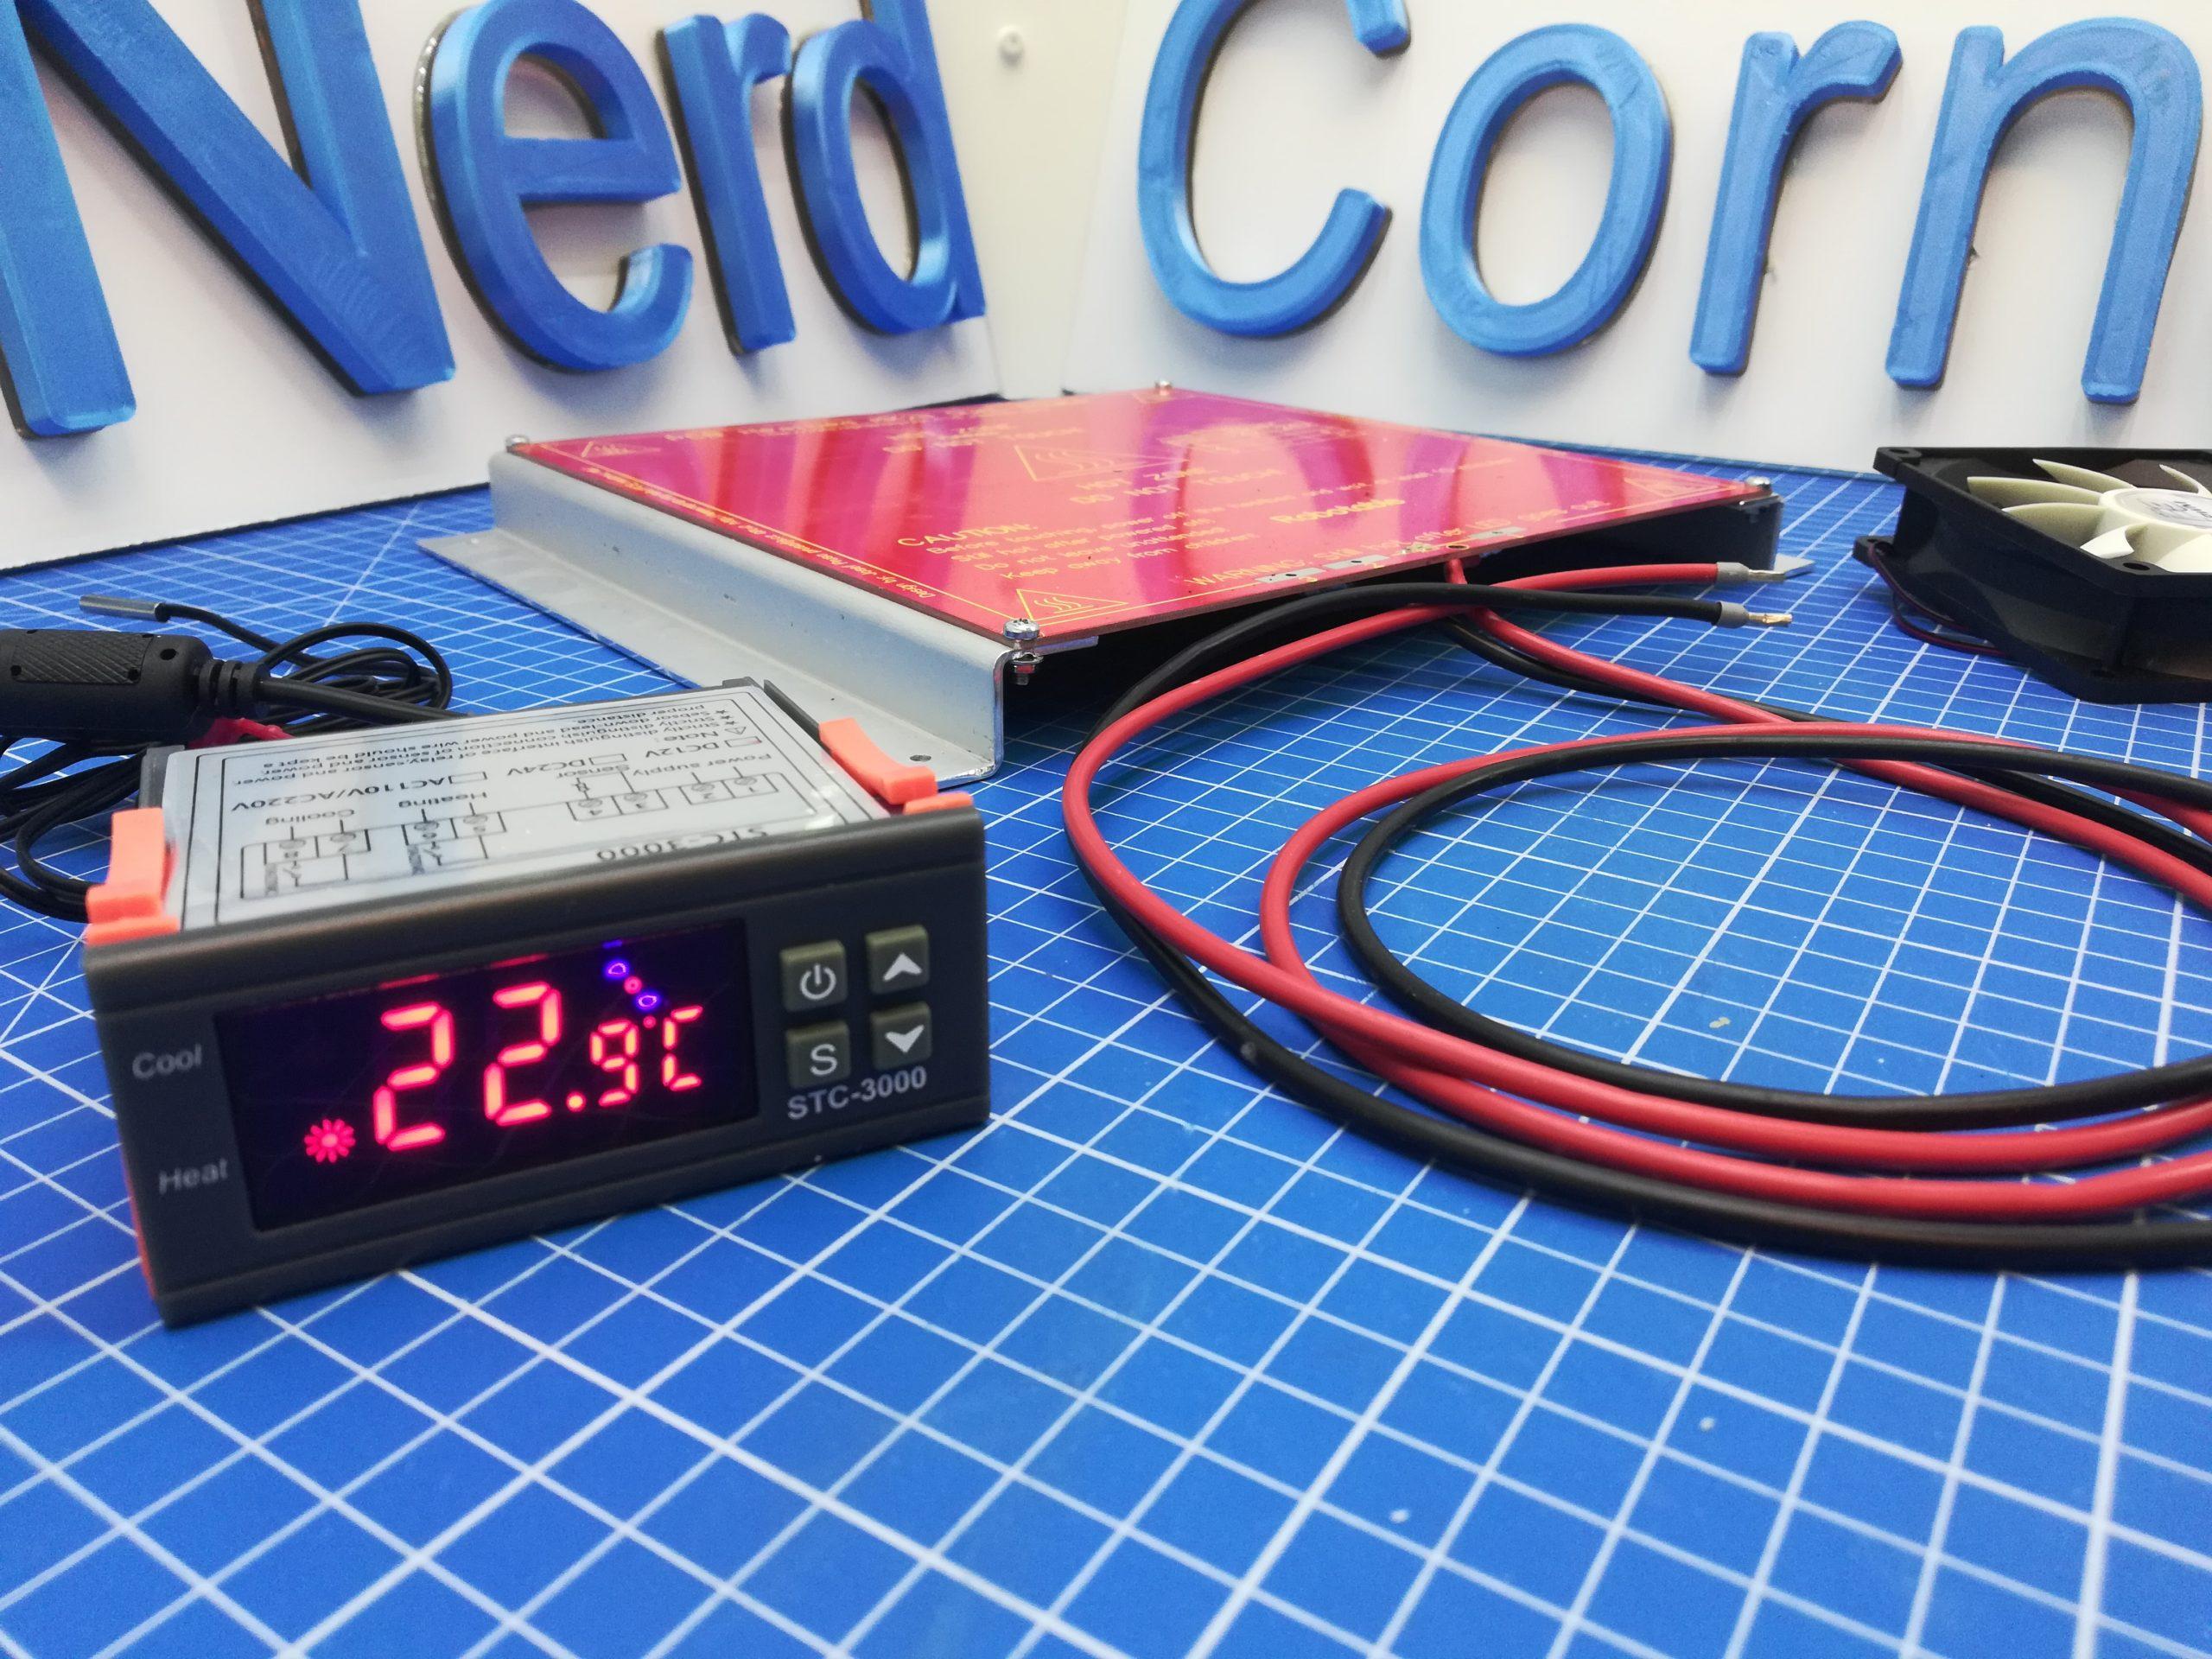 User guide STC 3000 Nerd Corner